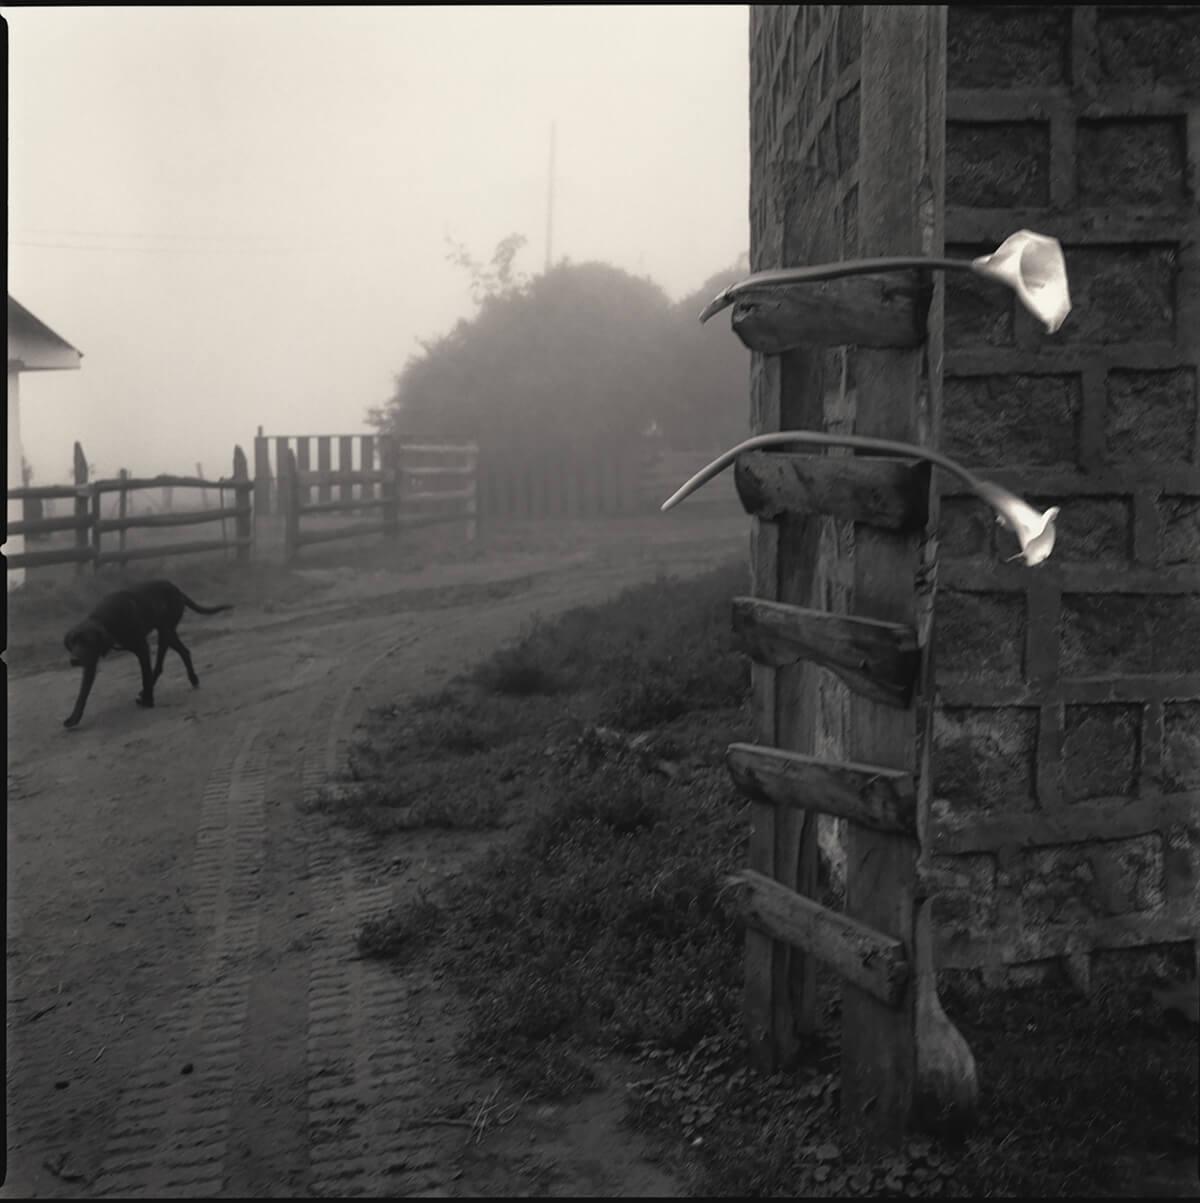 Hiroshi Watanabe Photographer All About Photo